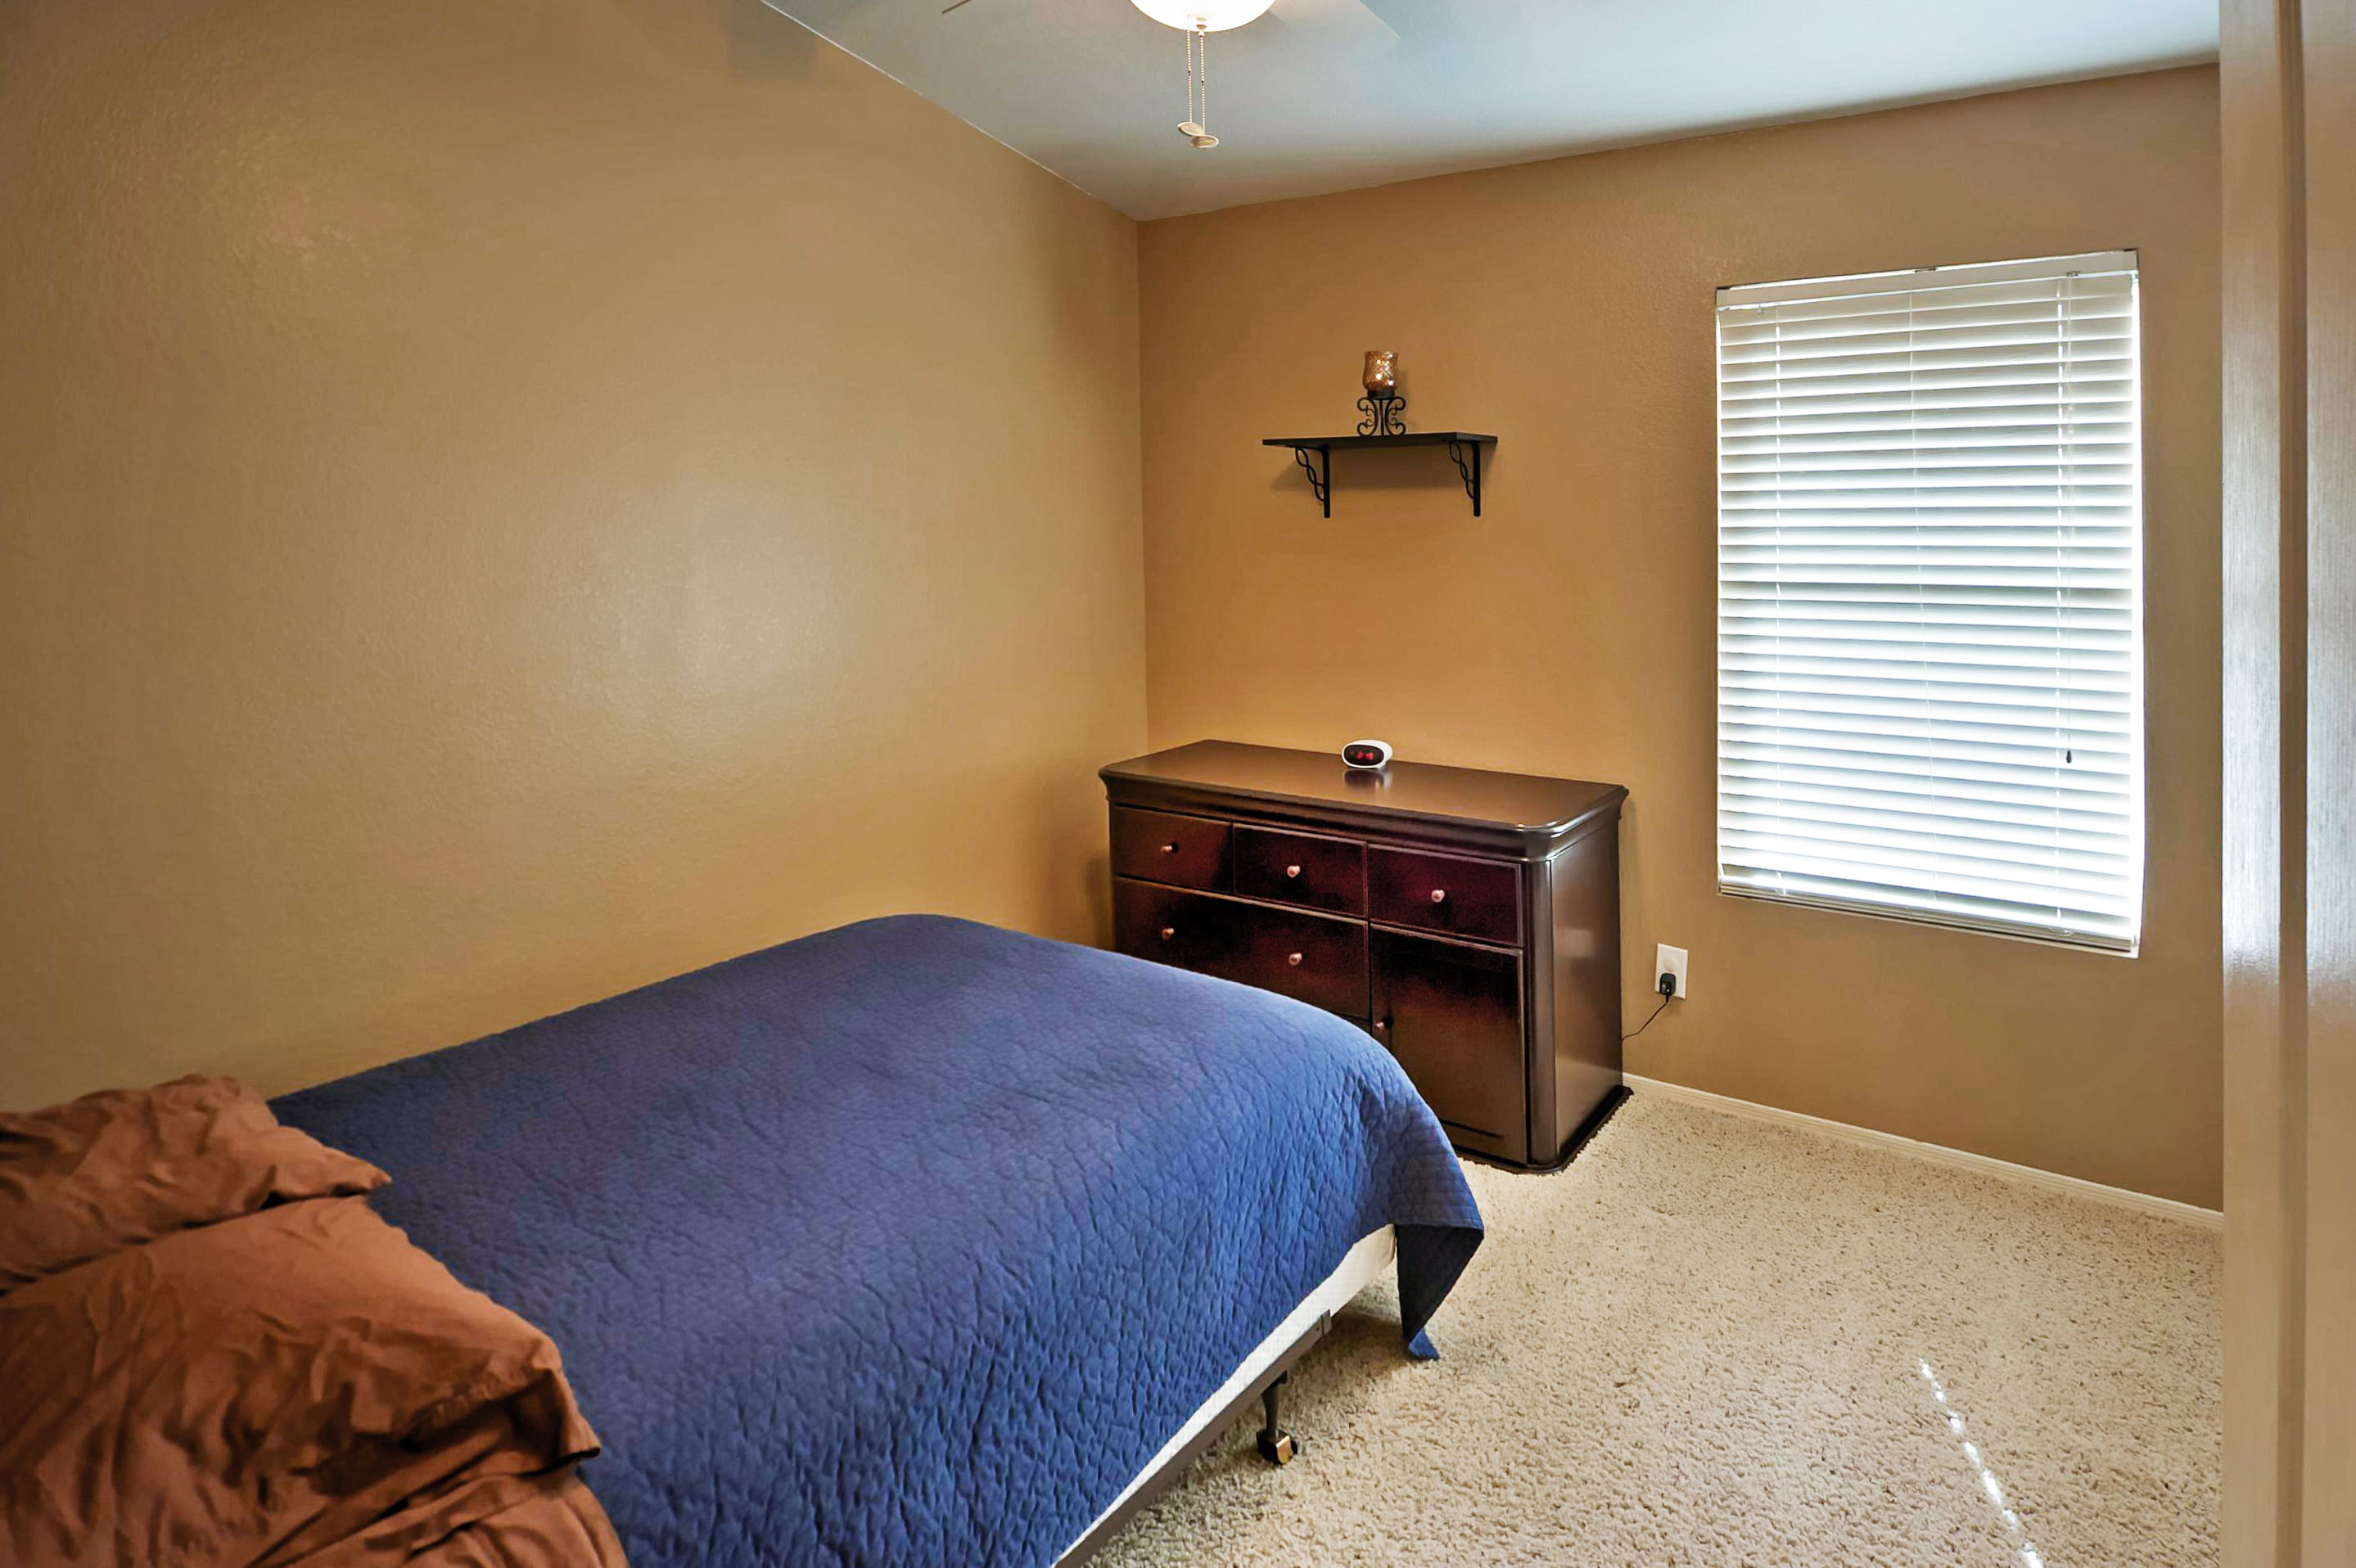 Bedroom 2 | Full Bed